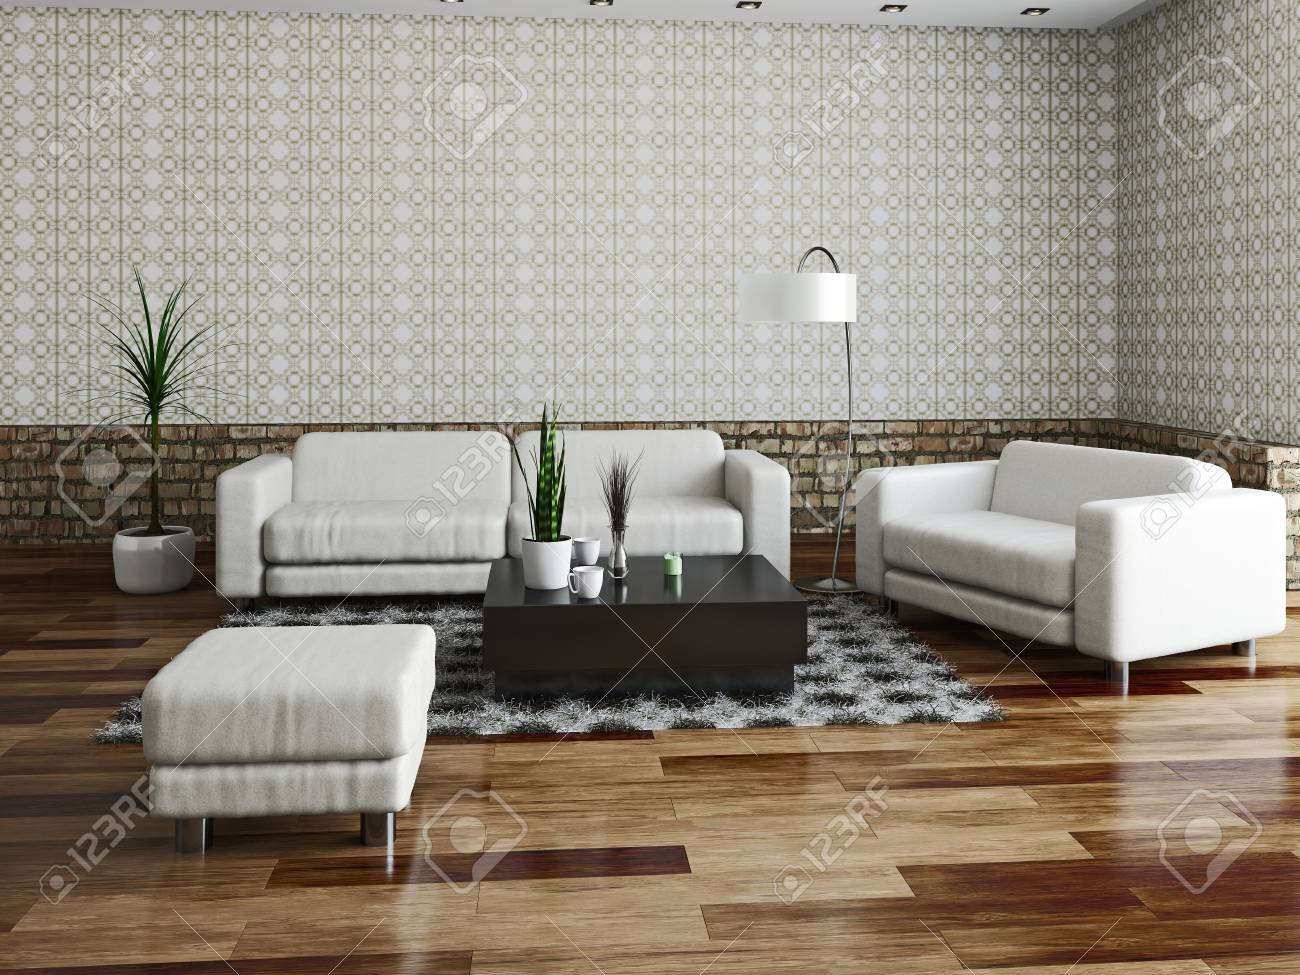 Sofa and armchair near a brick wall Stock Photo - 23195358